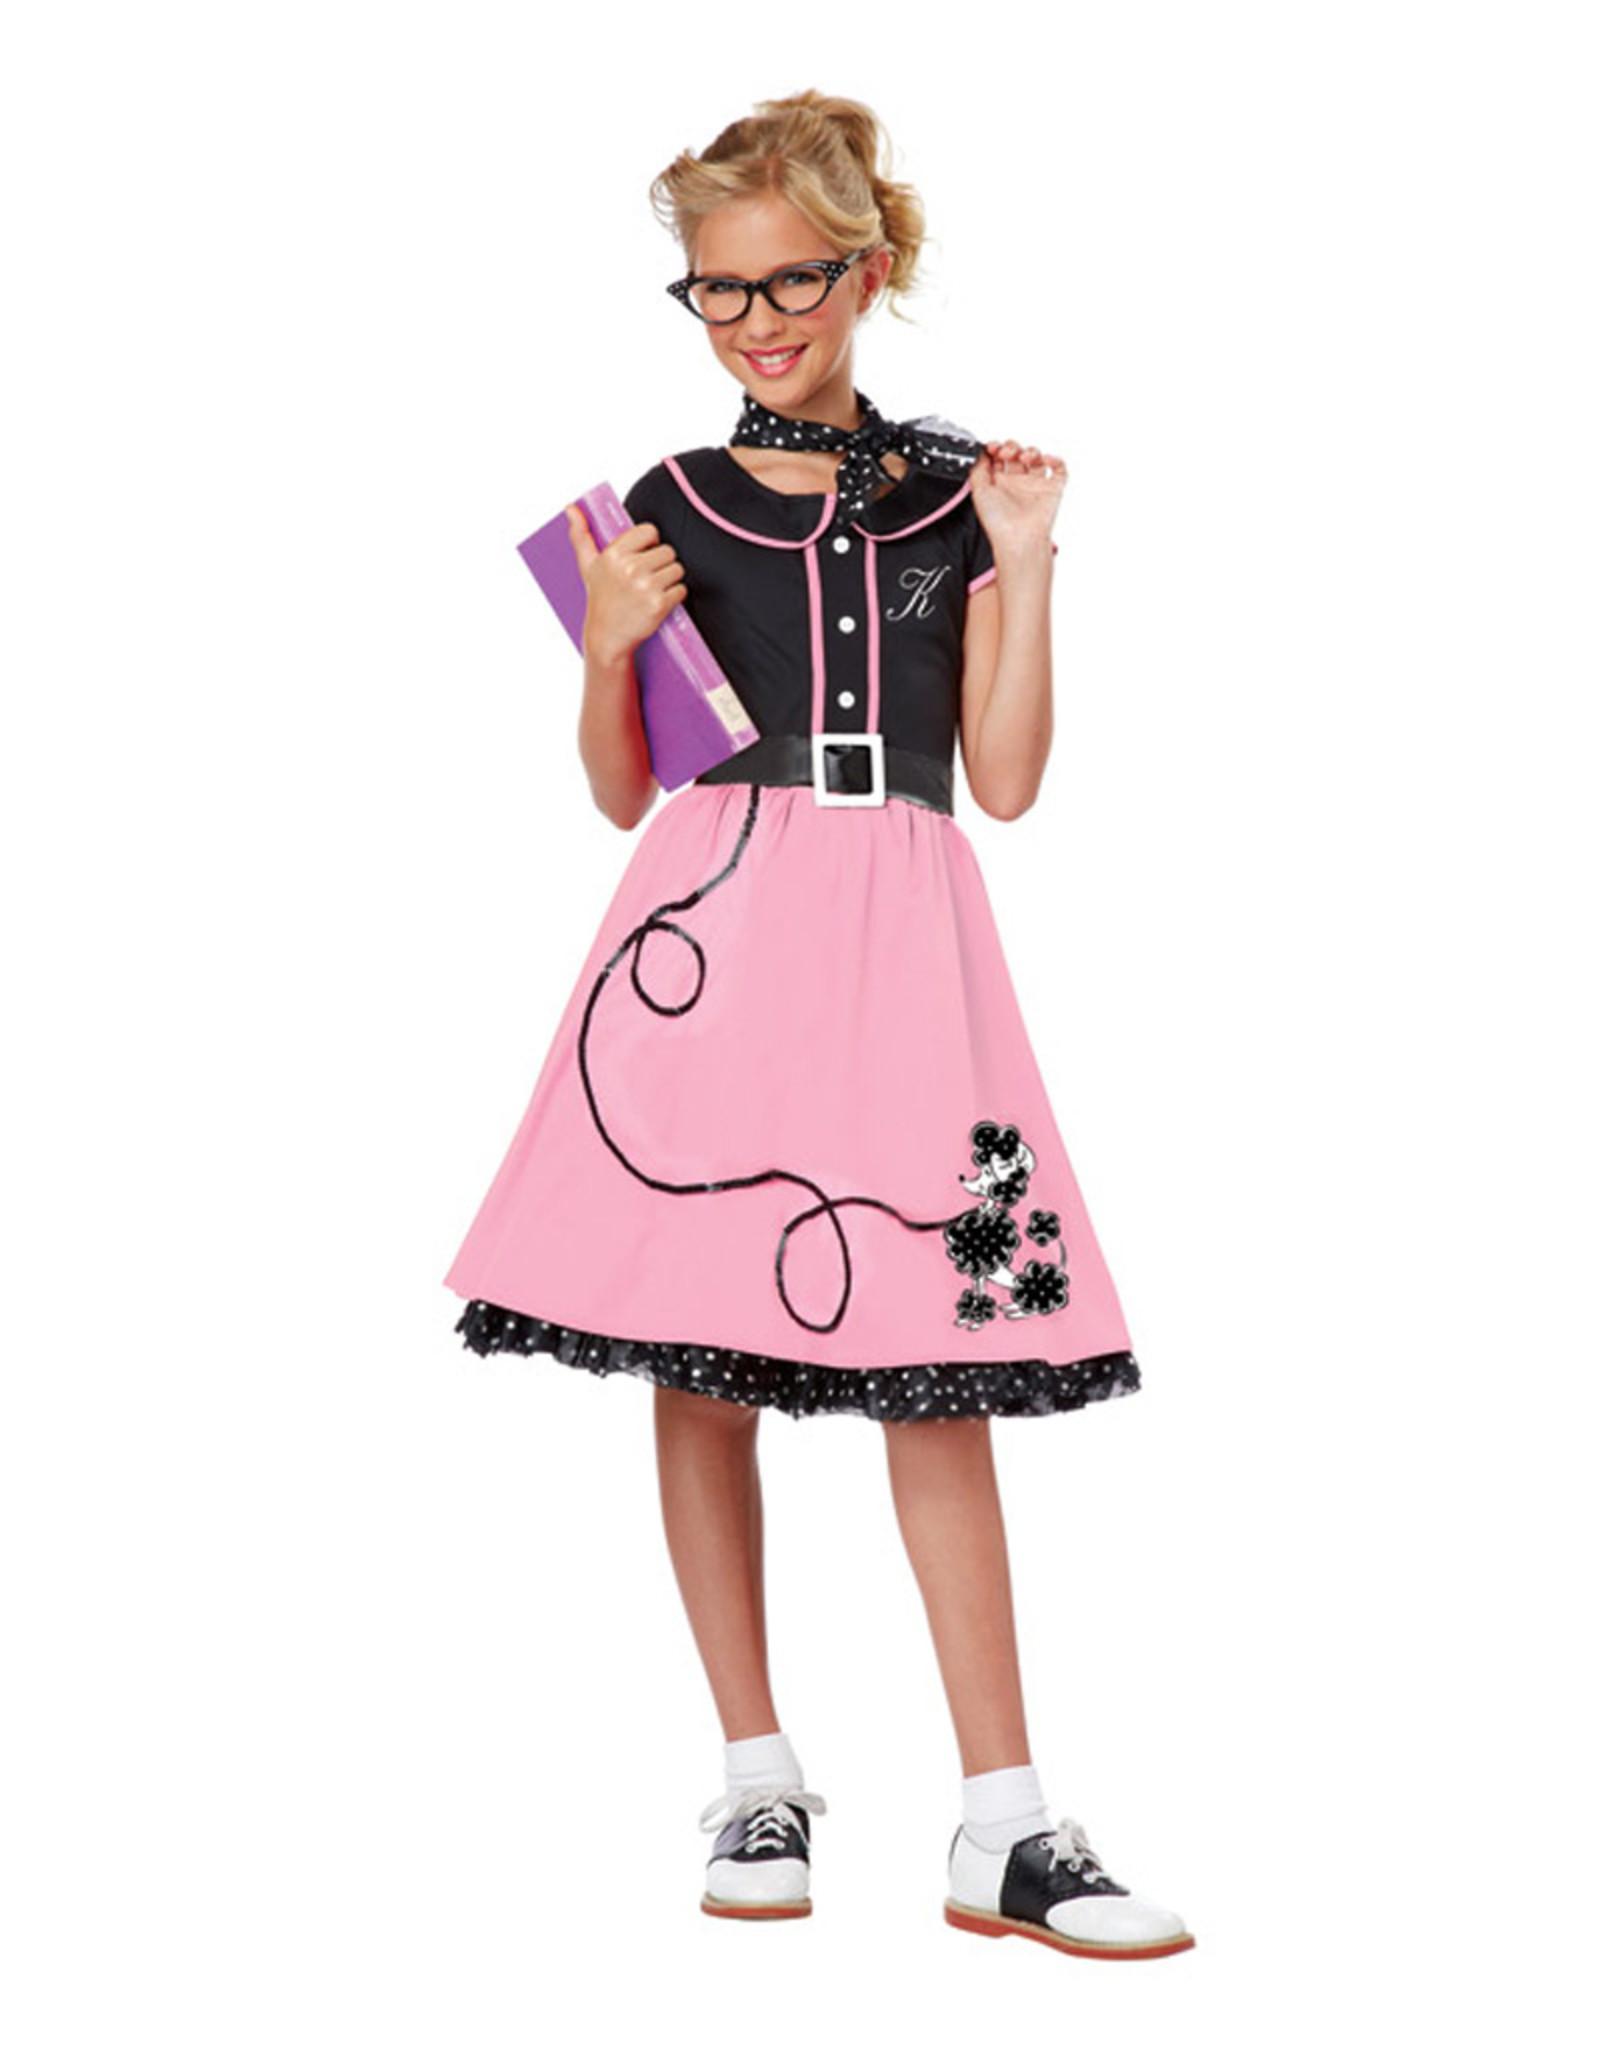 50's Sweetheart Costume - Girls